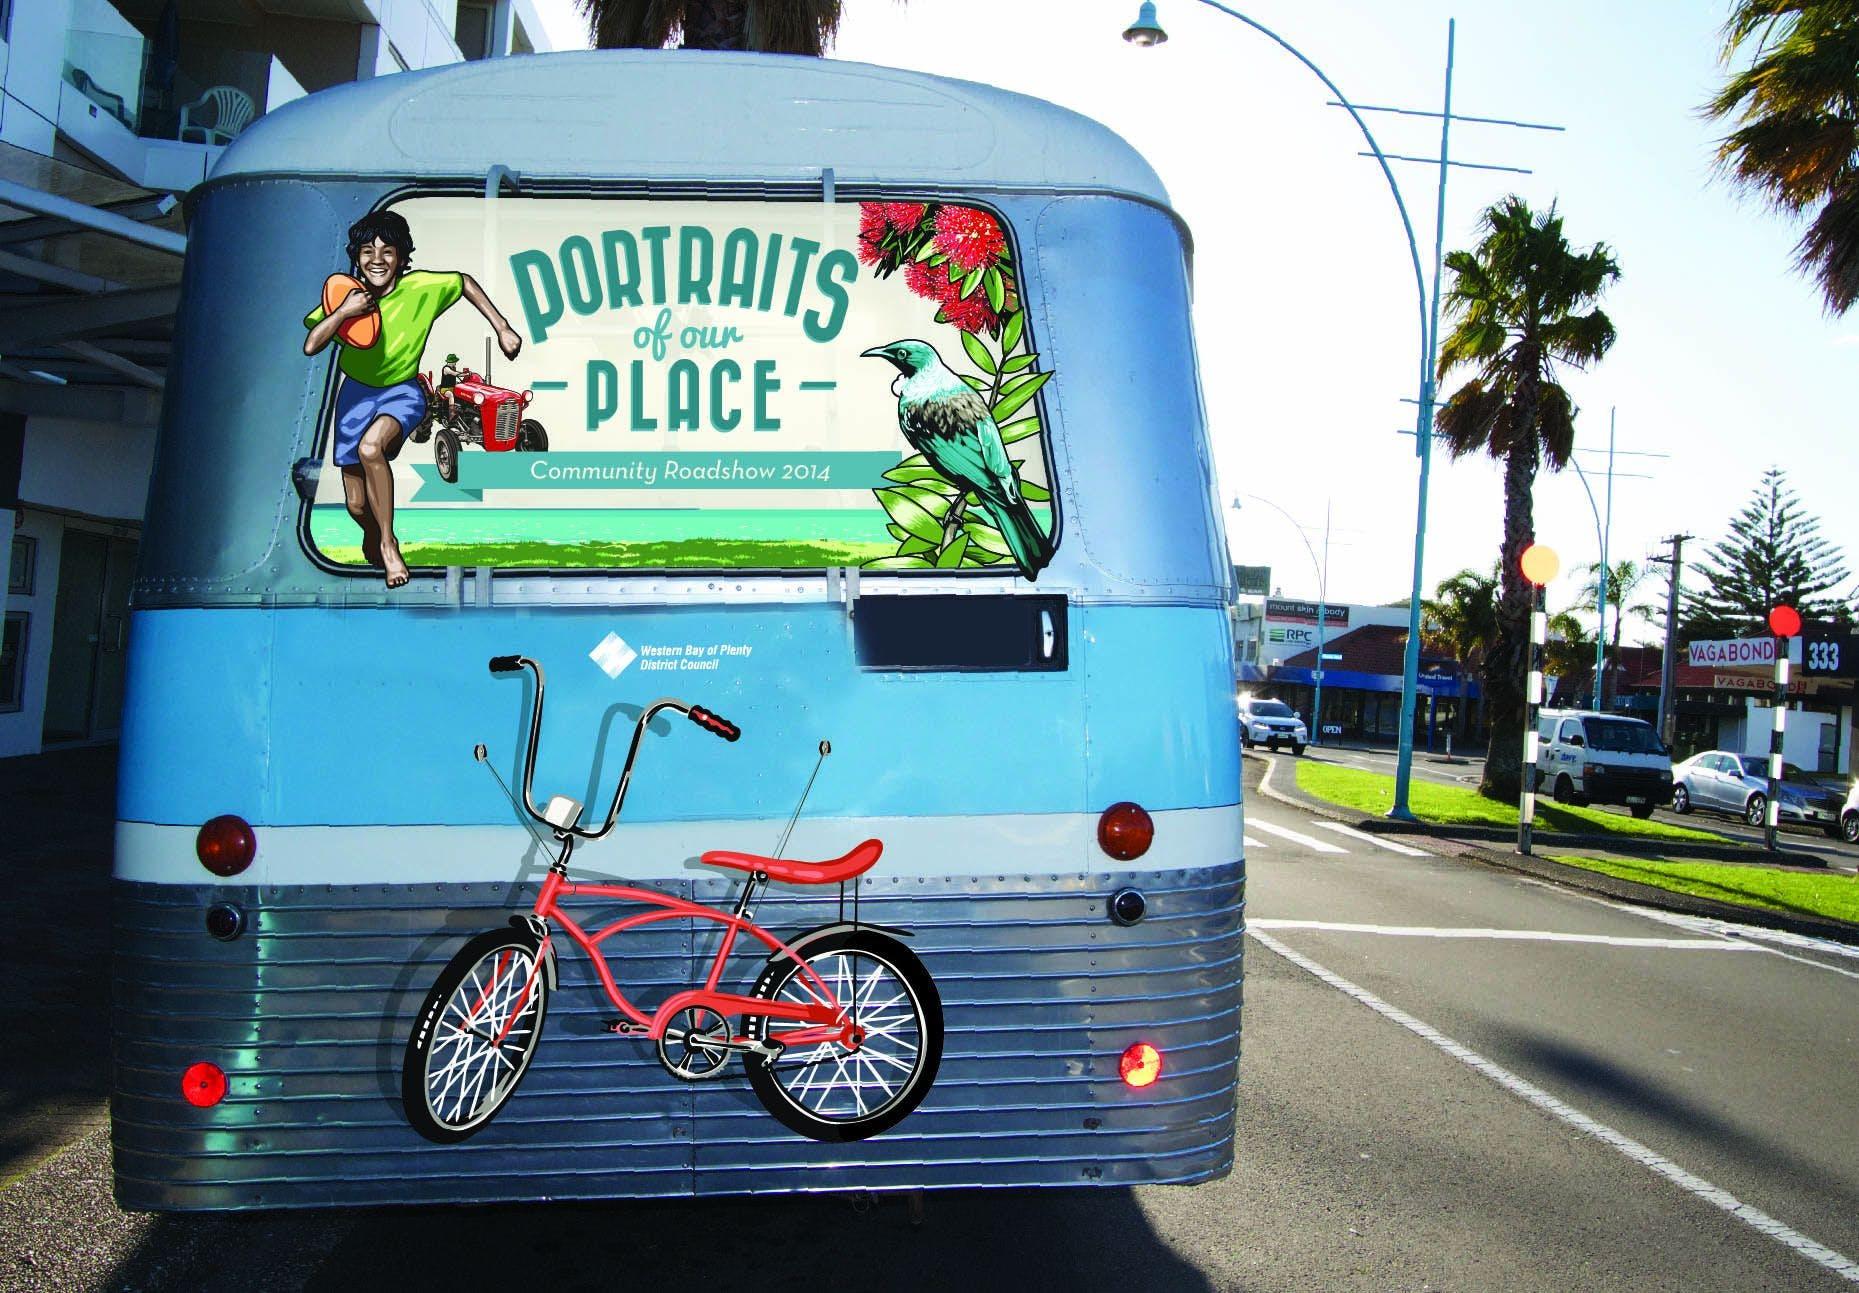 Community Engagement Bus - Rear View